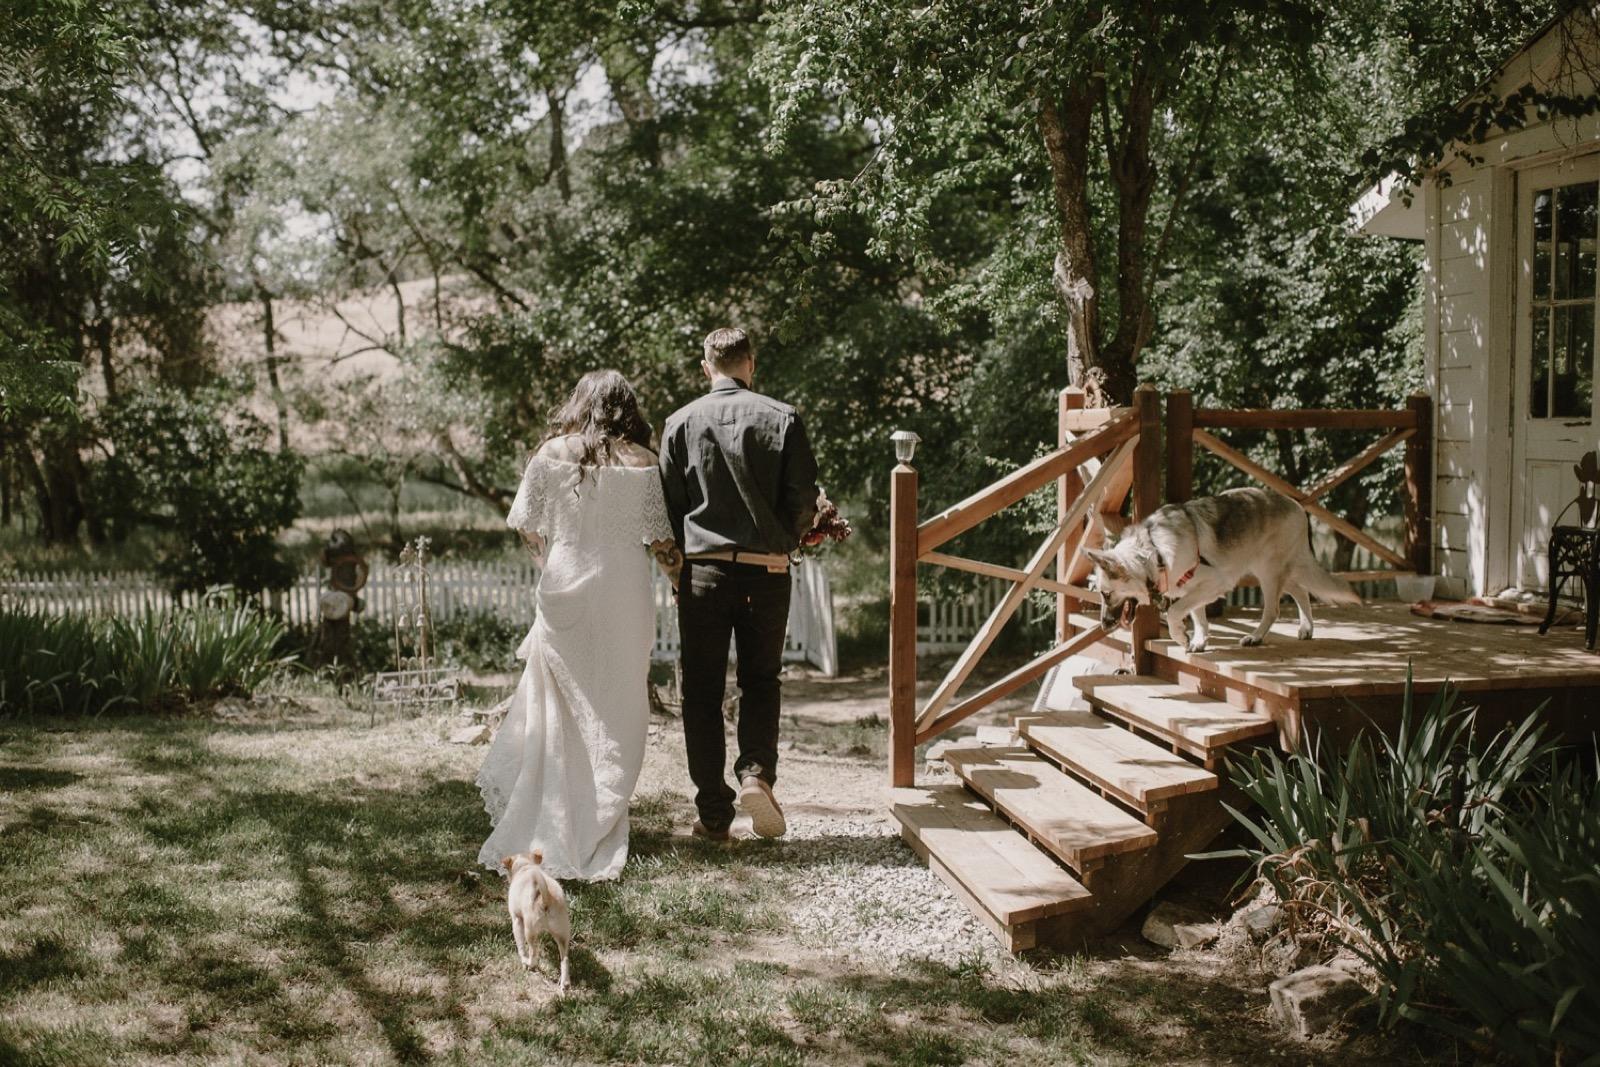 042_California_Ranch_Wedding099.jpg